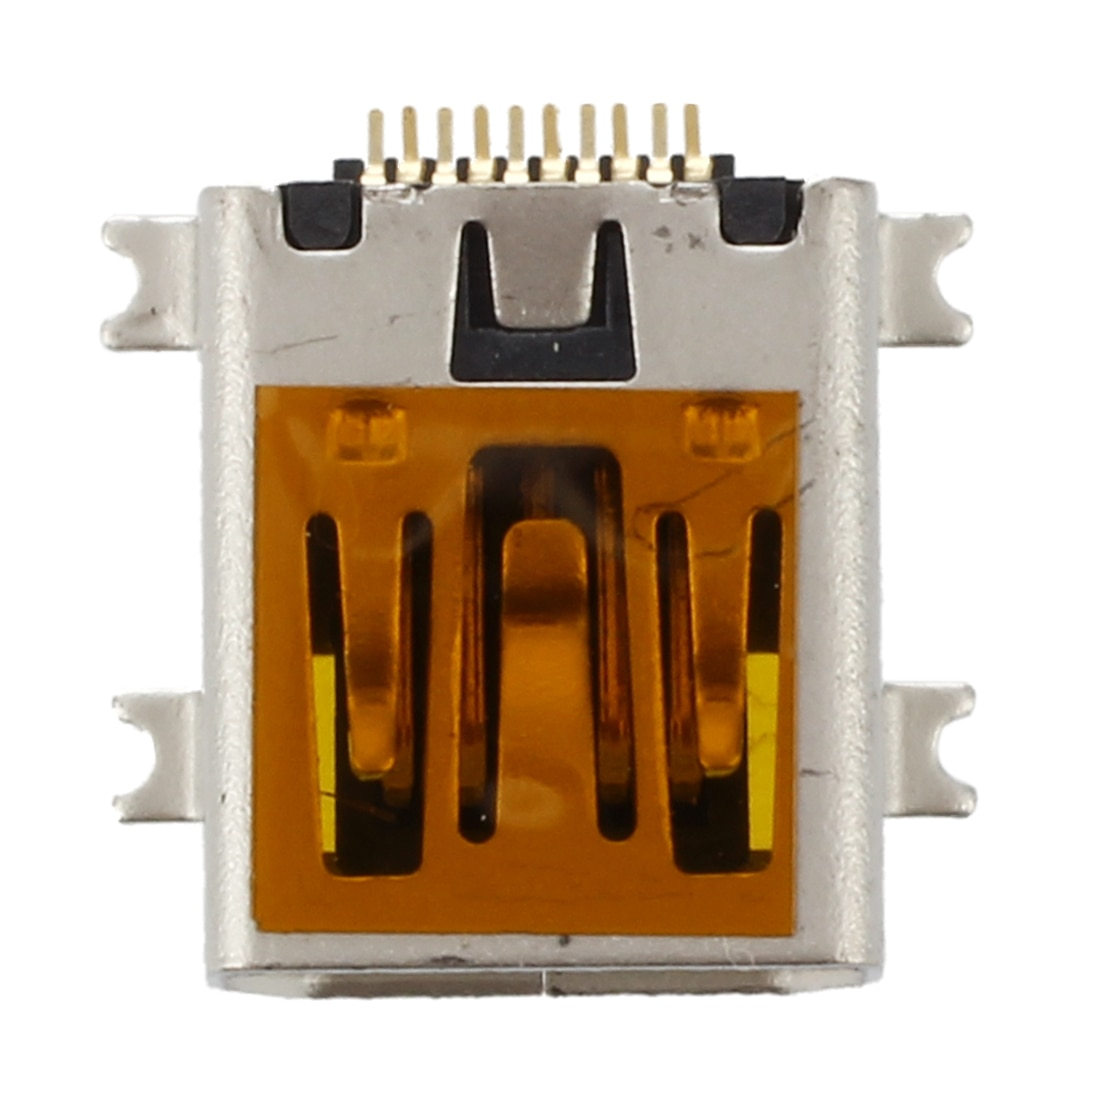 SNNY-10 Pcs Female Mini USB Type B 10 Pin SMT SMD Mount Jack Connector Port